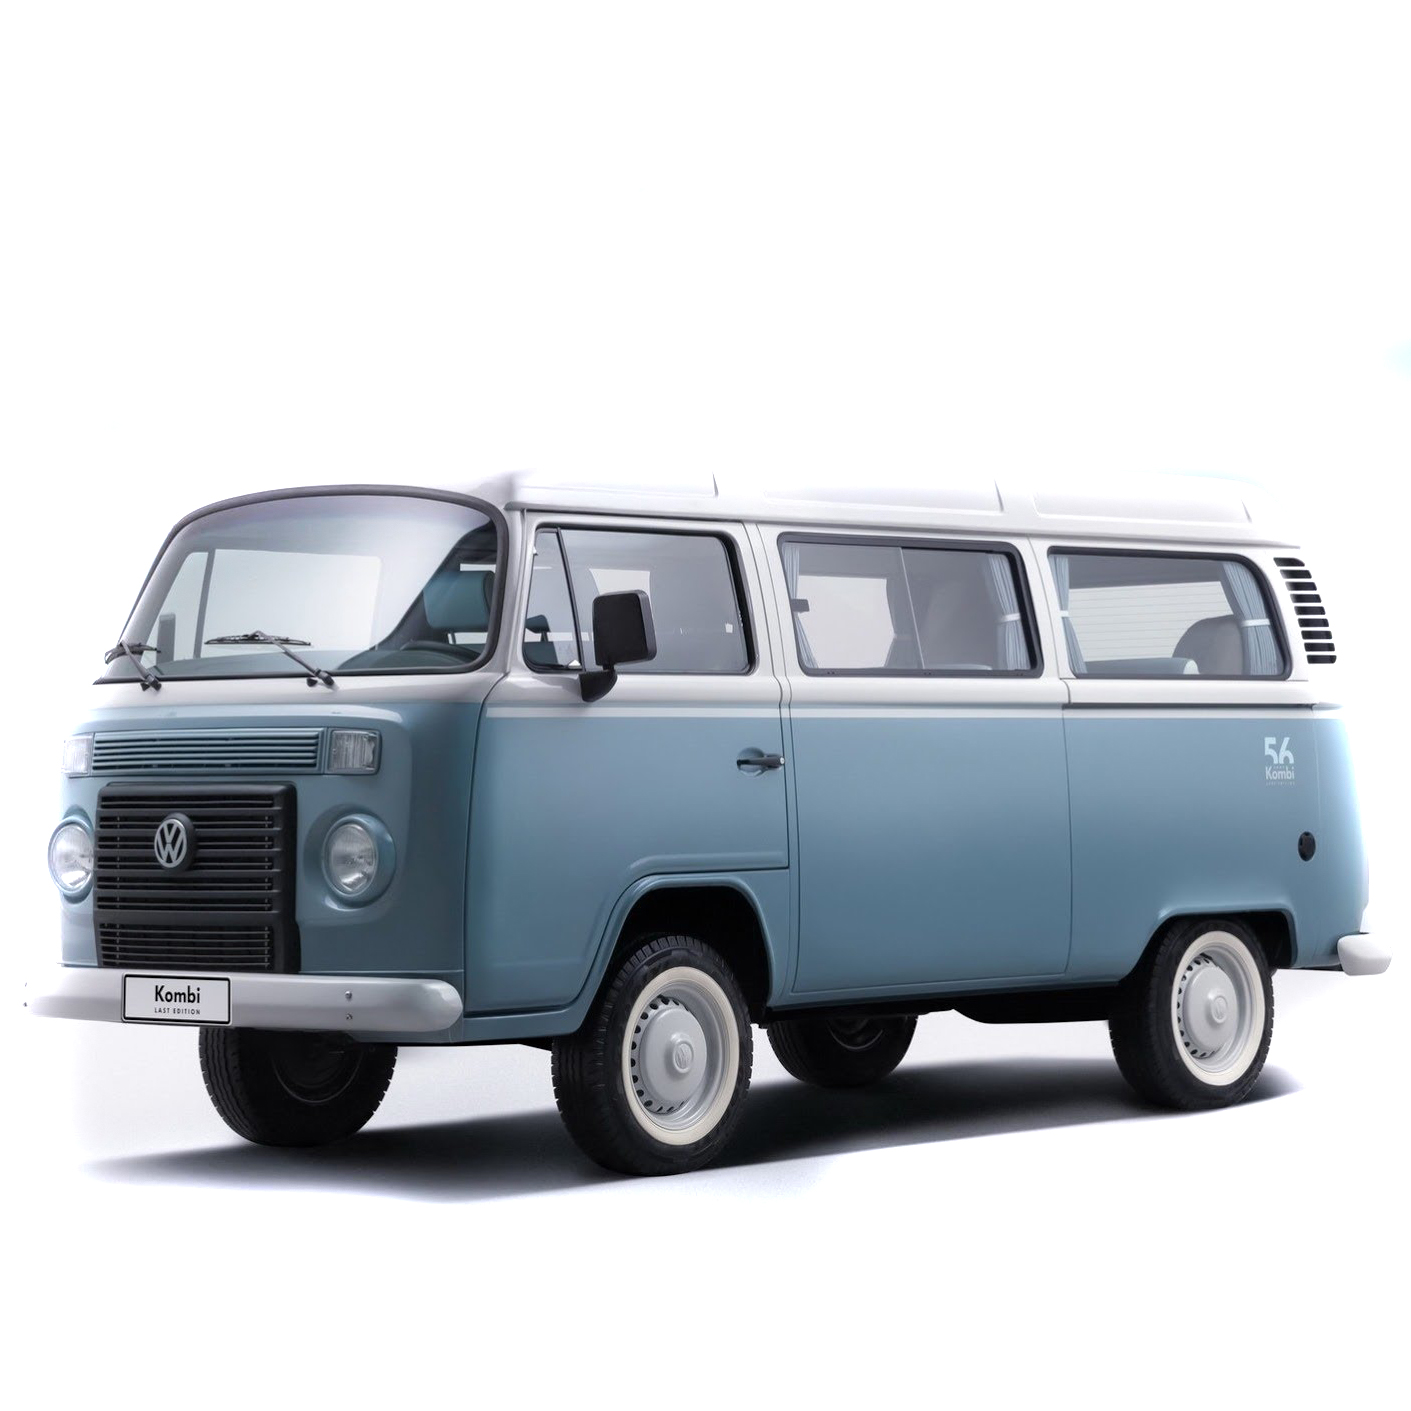 Volkswagen Kombi [Single Passenger] [2 rows] 2003 - 2012